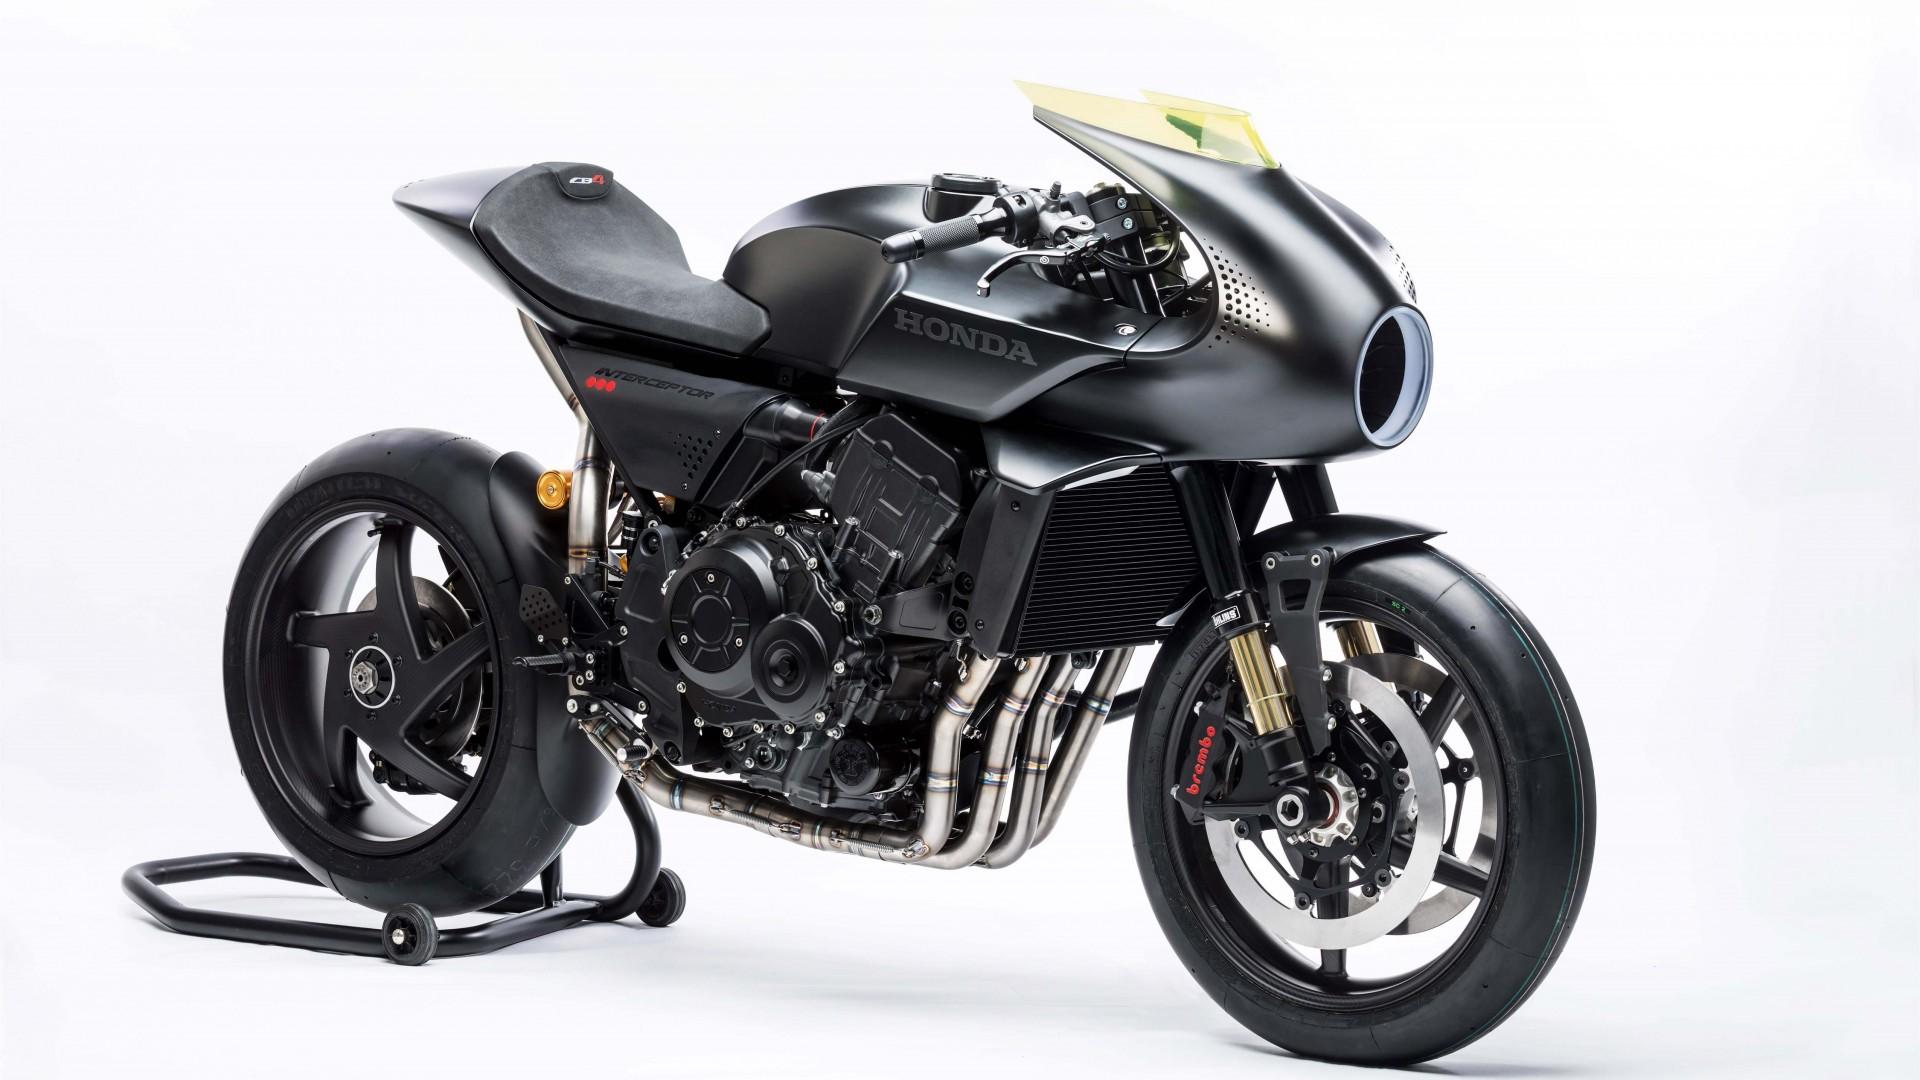 honda-cb4-interceptor-1920x1080-futuristic-concept-bikes-4k-10987